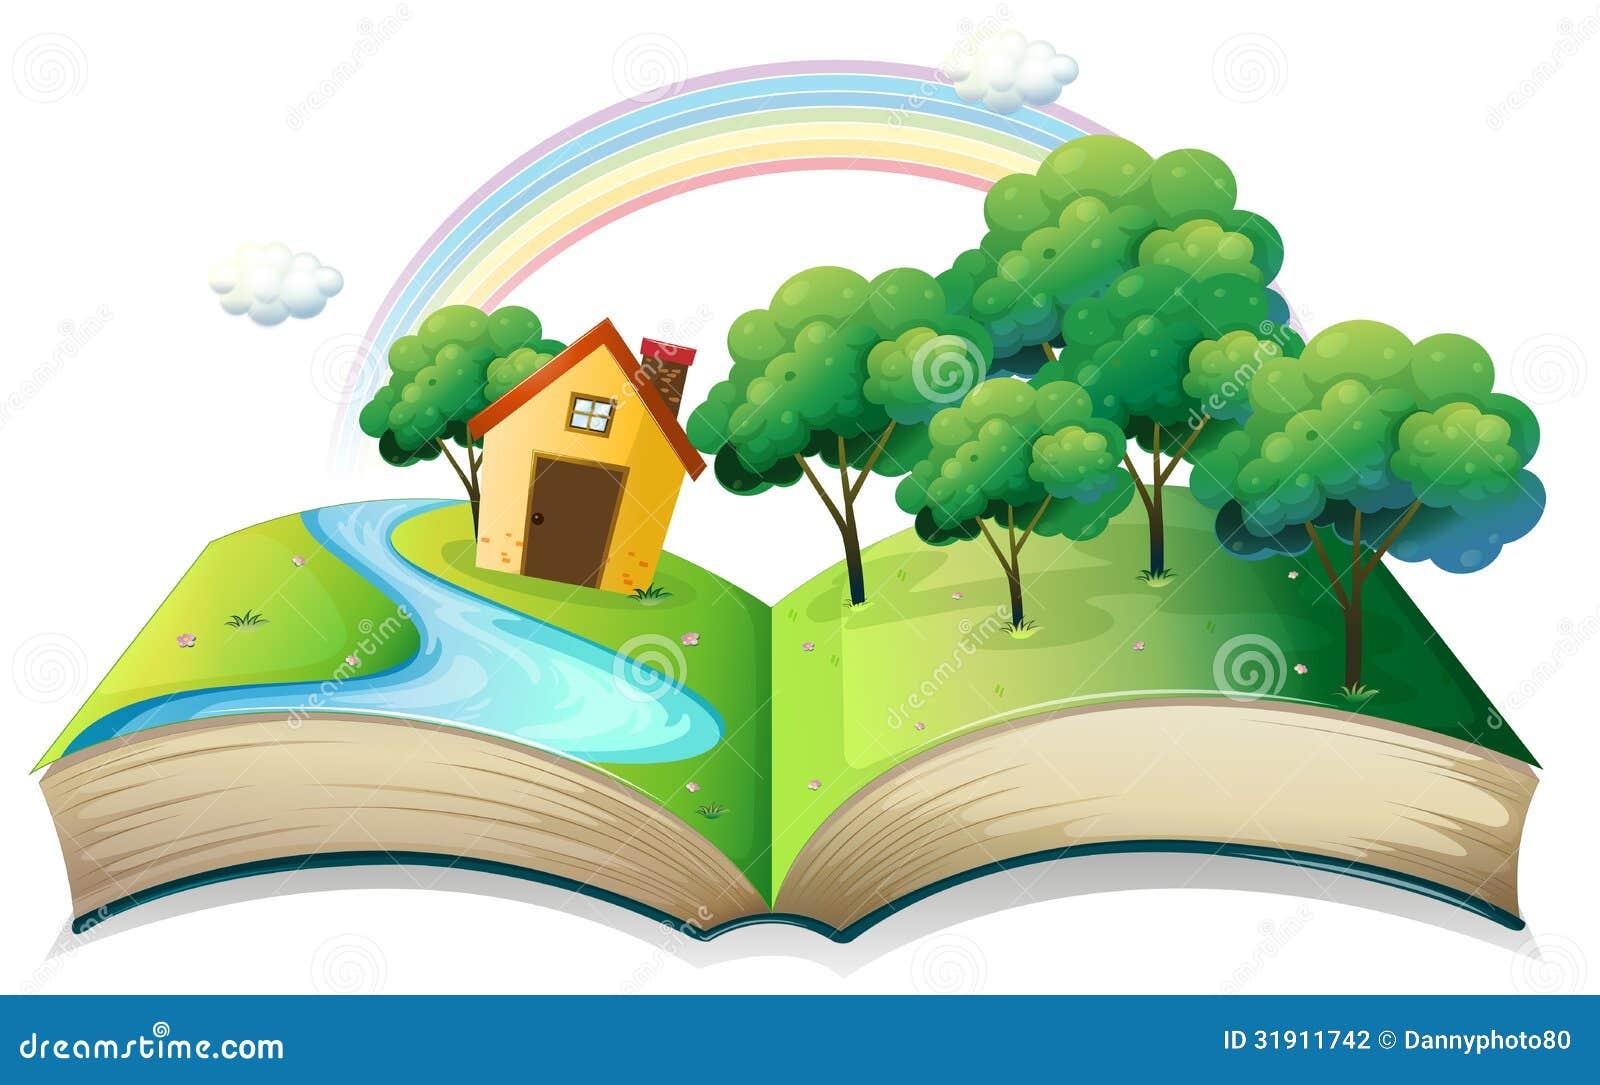 En bok med en berättelse av ett hus på skogen